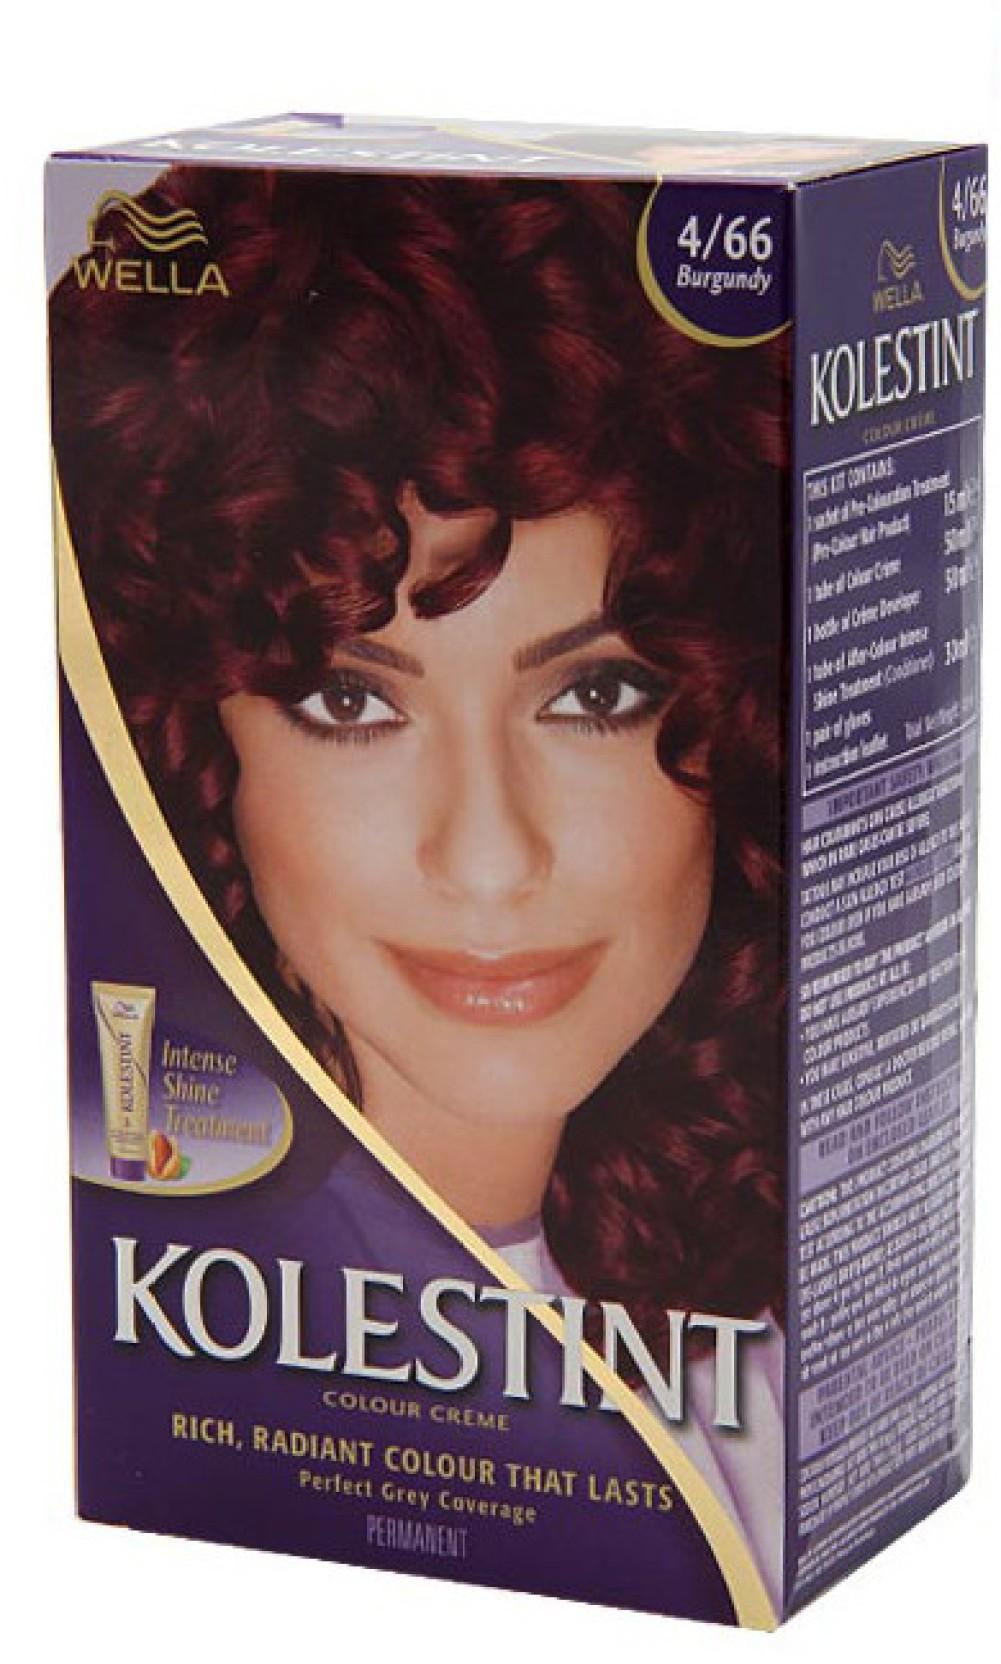 Wella Professionals Kolestint Hair Color Price In India Buy Wella